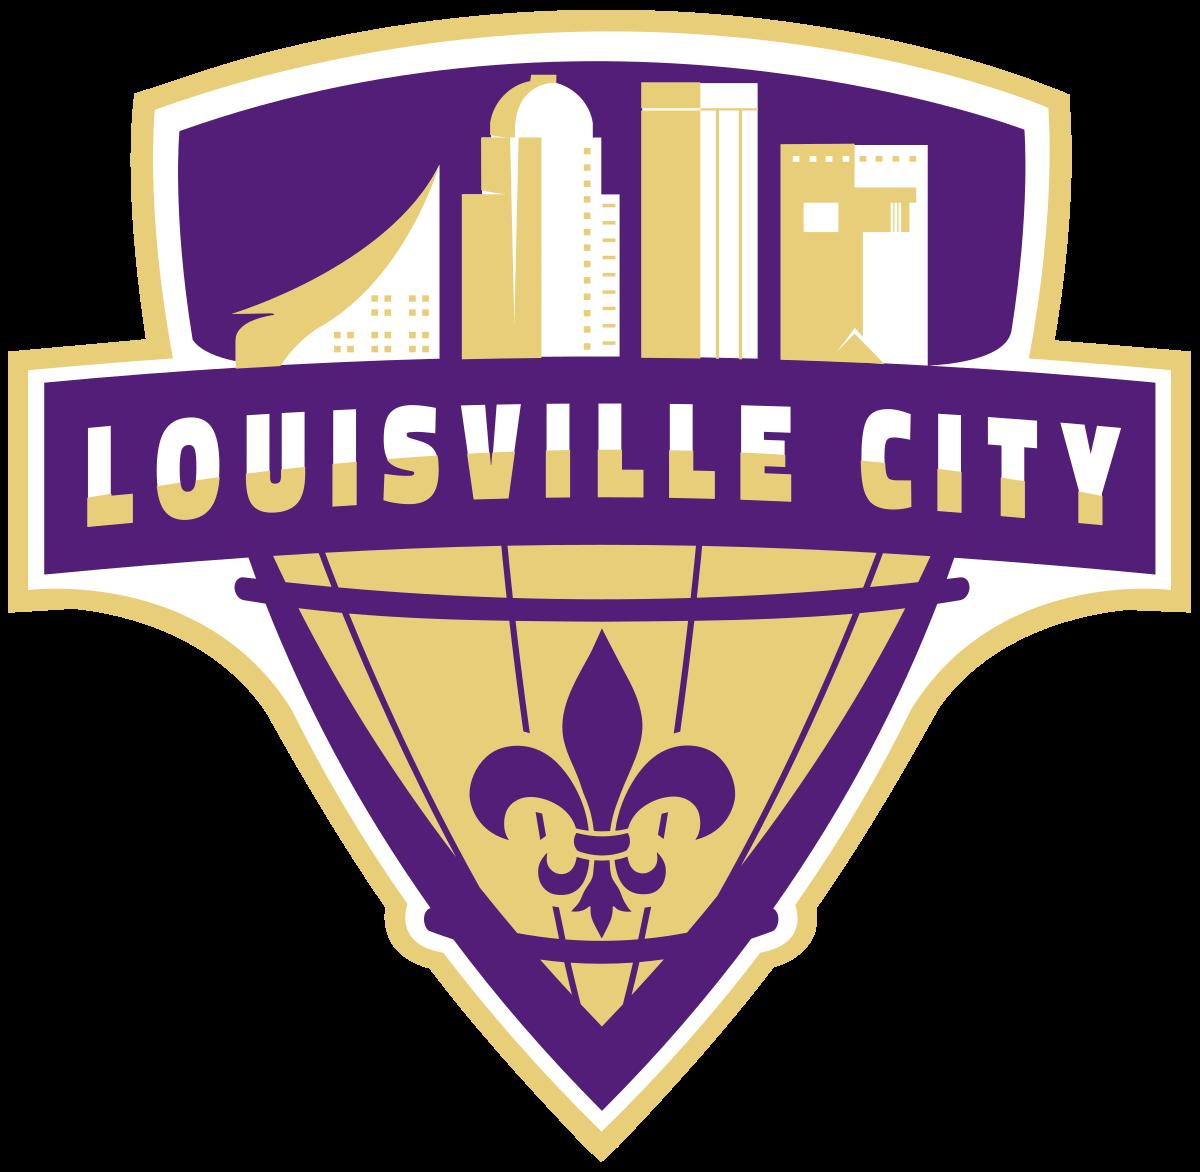 Louisville City logo